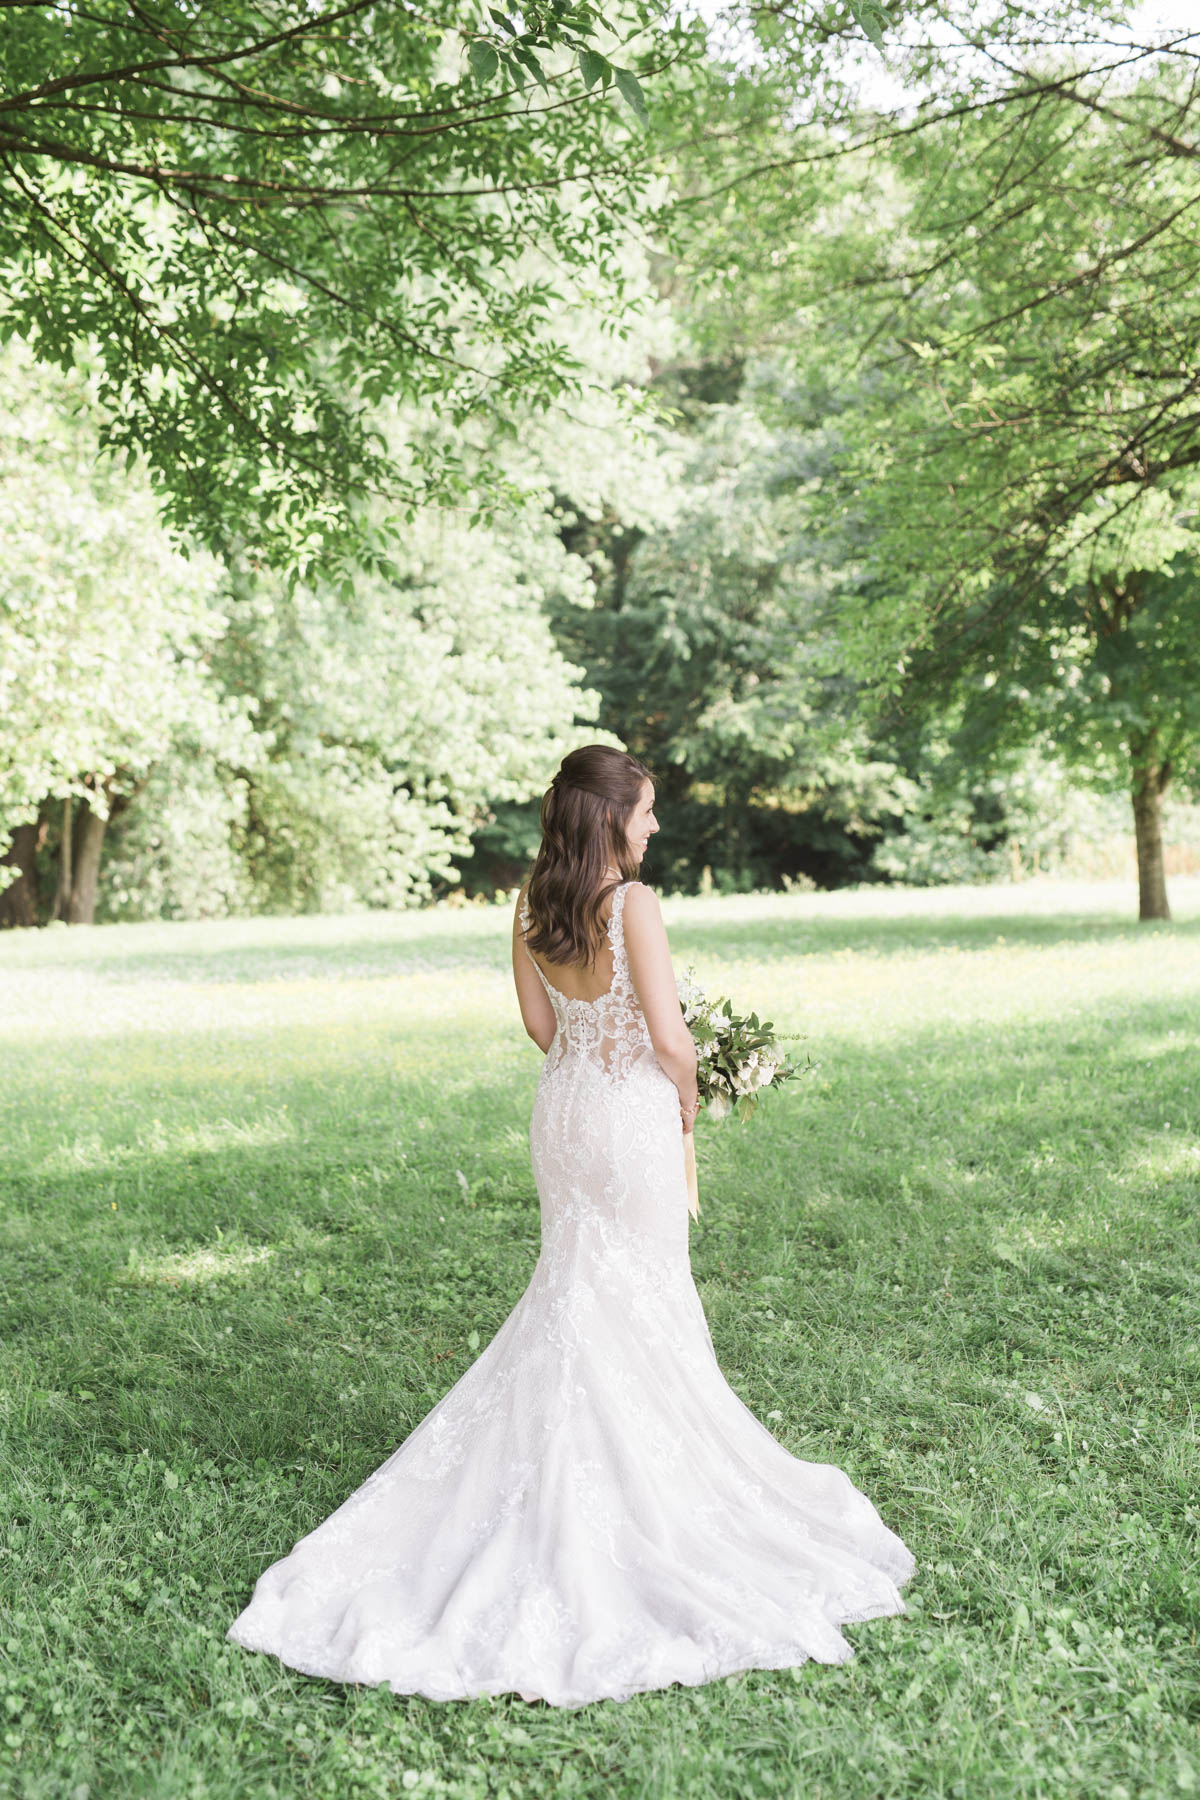 shotbychelsea_wedding_blog-30.jpg